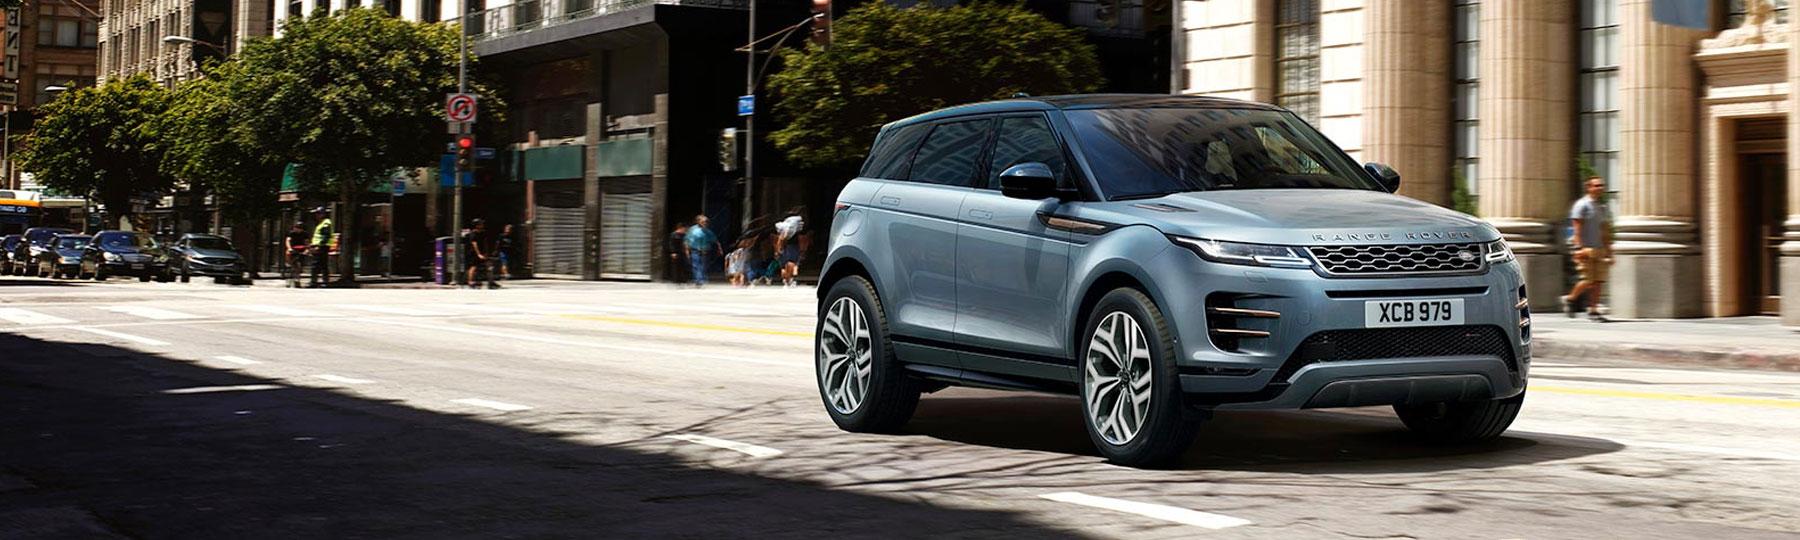 land rover Range Rover Evoque New Car Offer